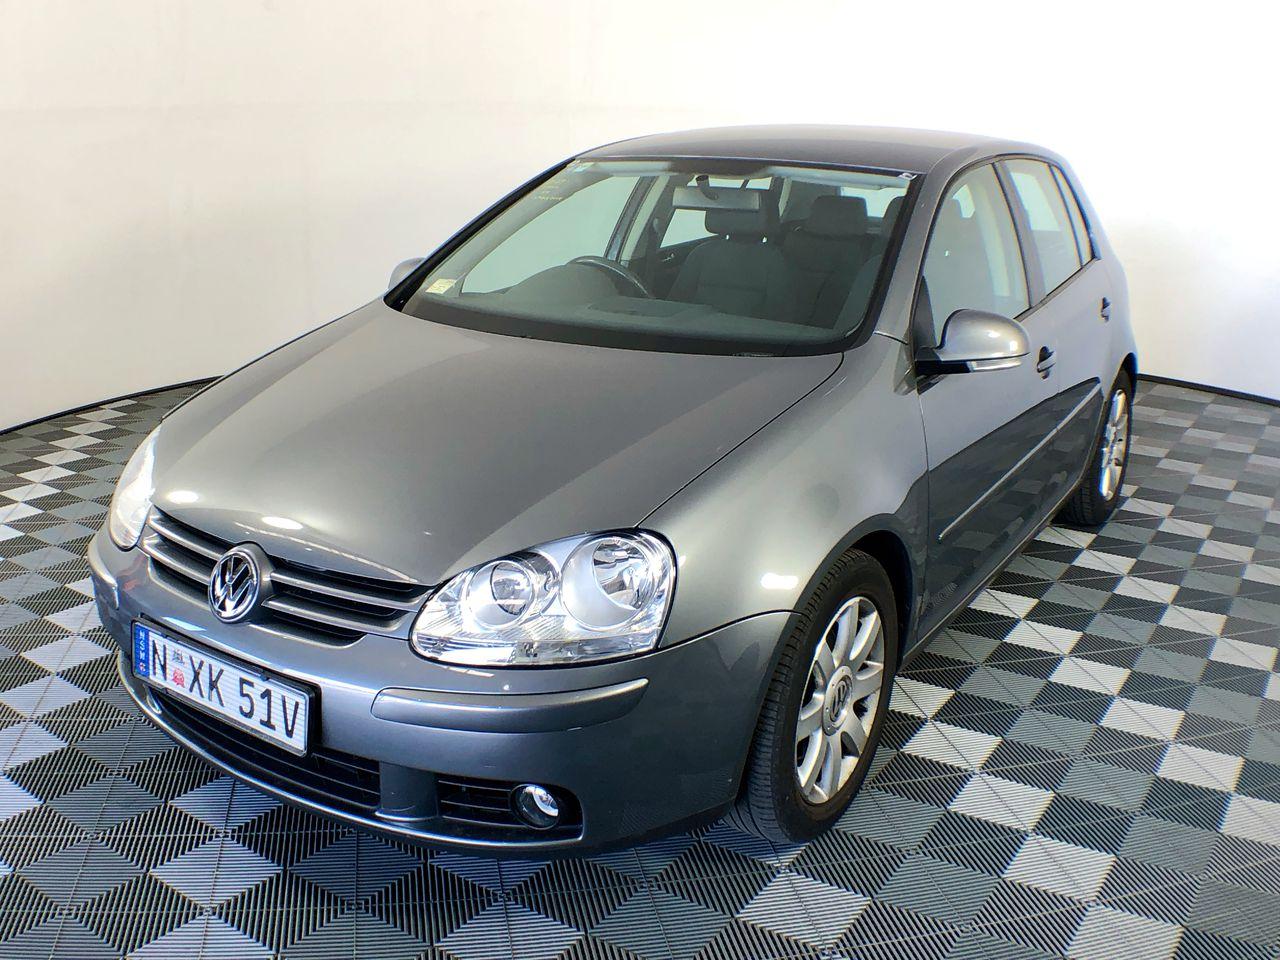 2005 Volkswagen Golf 2.0 FSI Sportline 1k Automatic Hatchback 63,041km